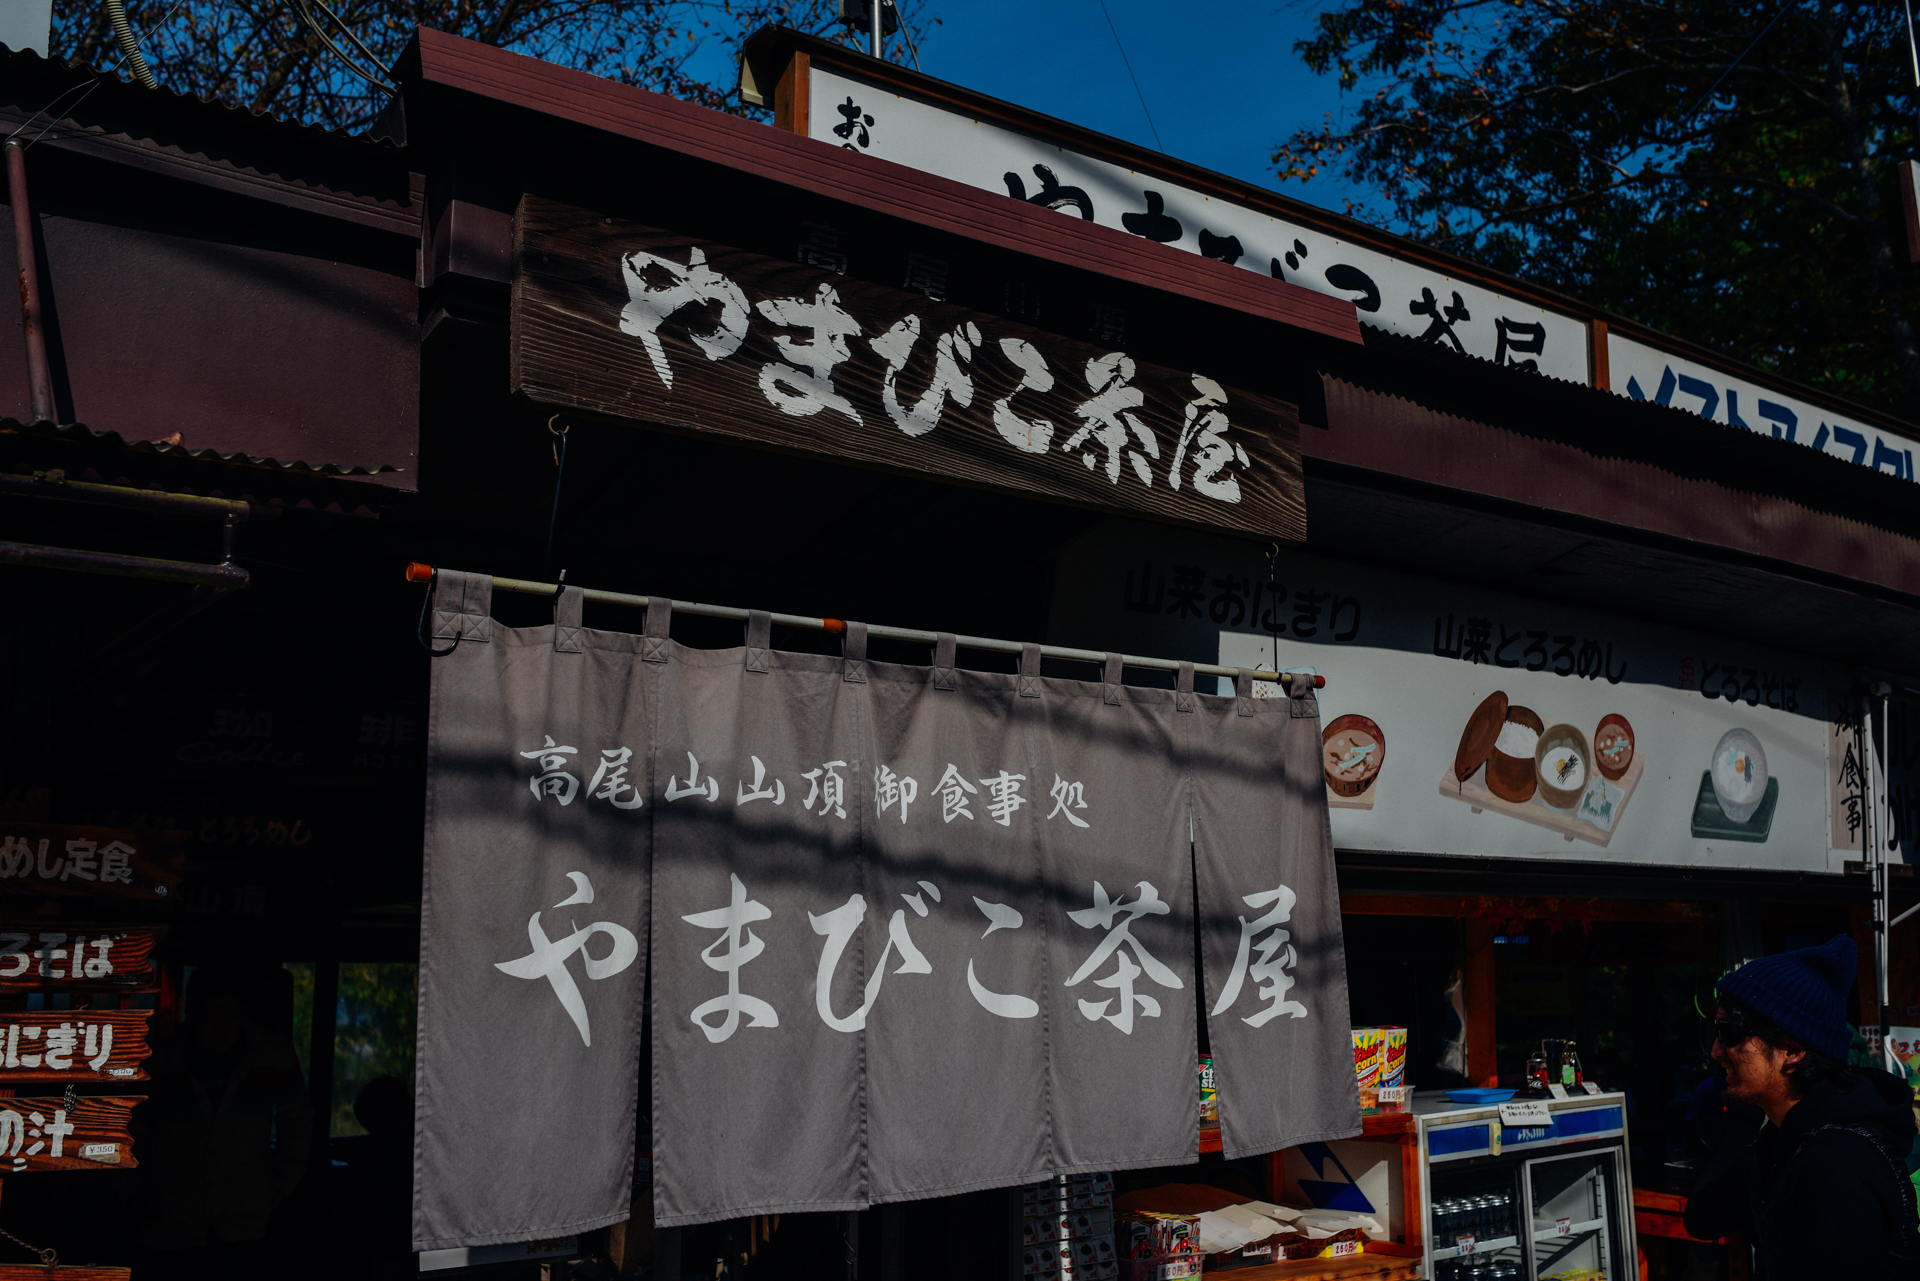 f:id:sakemaro:20151216005239j:plain